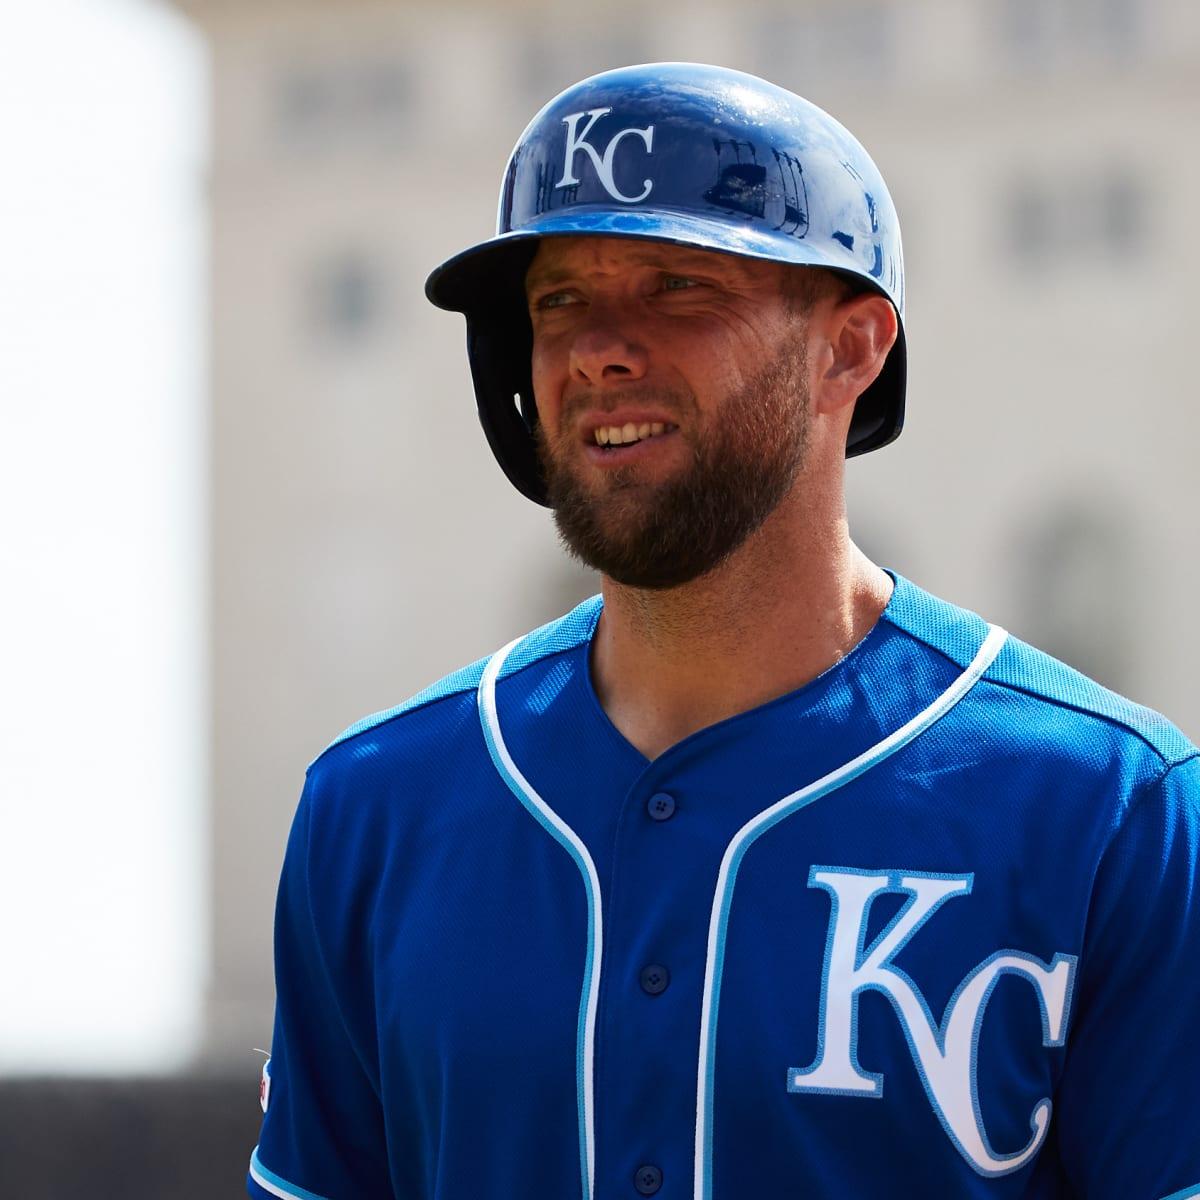 Alex Gordon Kansas City Royal Baseball Player Jersey